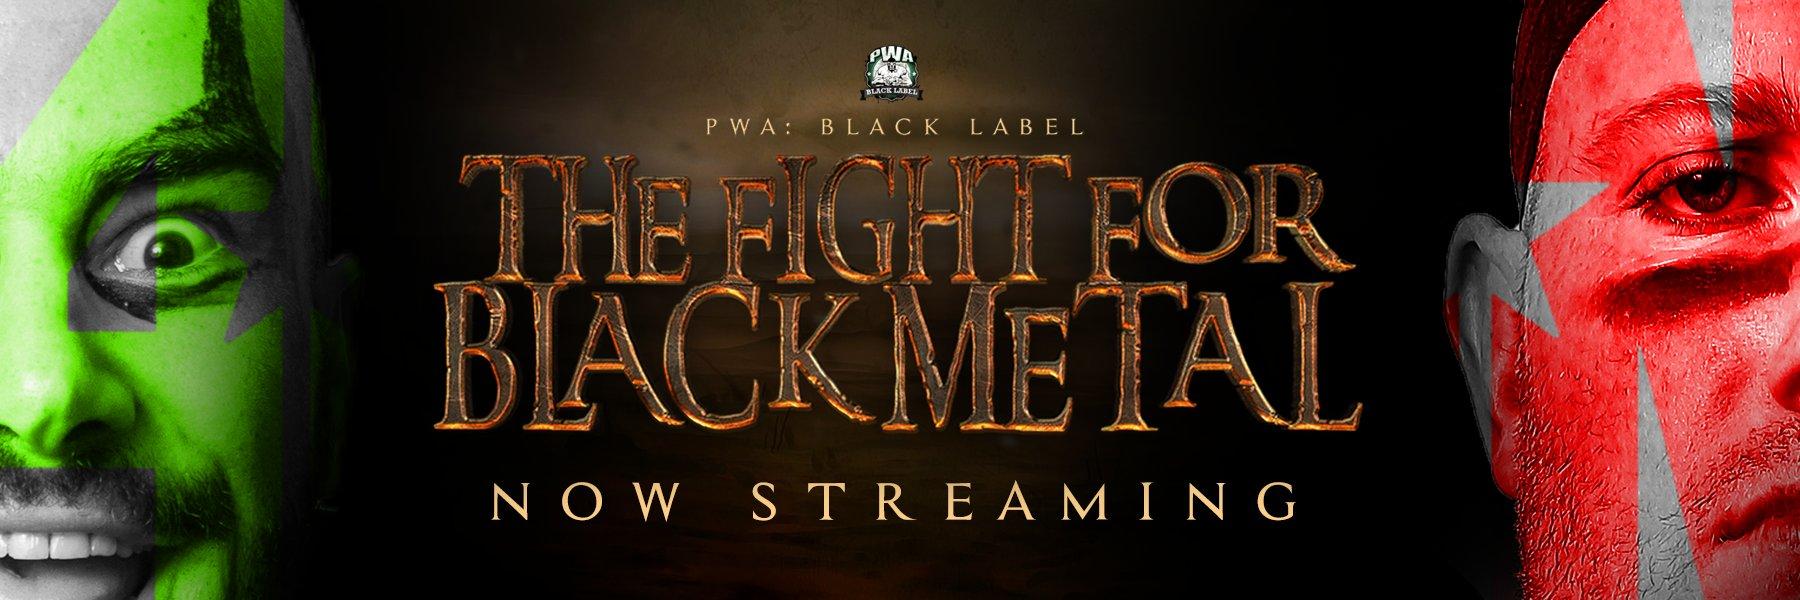 #PWAFIGHTFORBLACKMETAL - STREAMING NOW